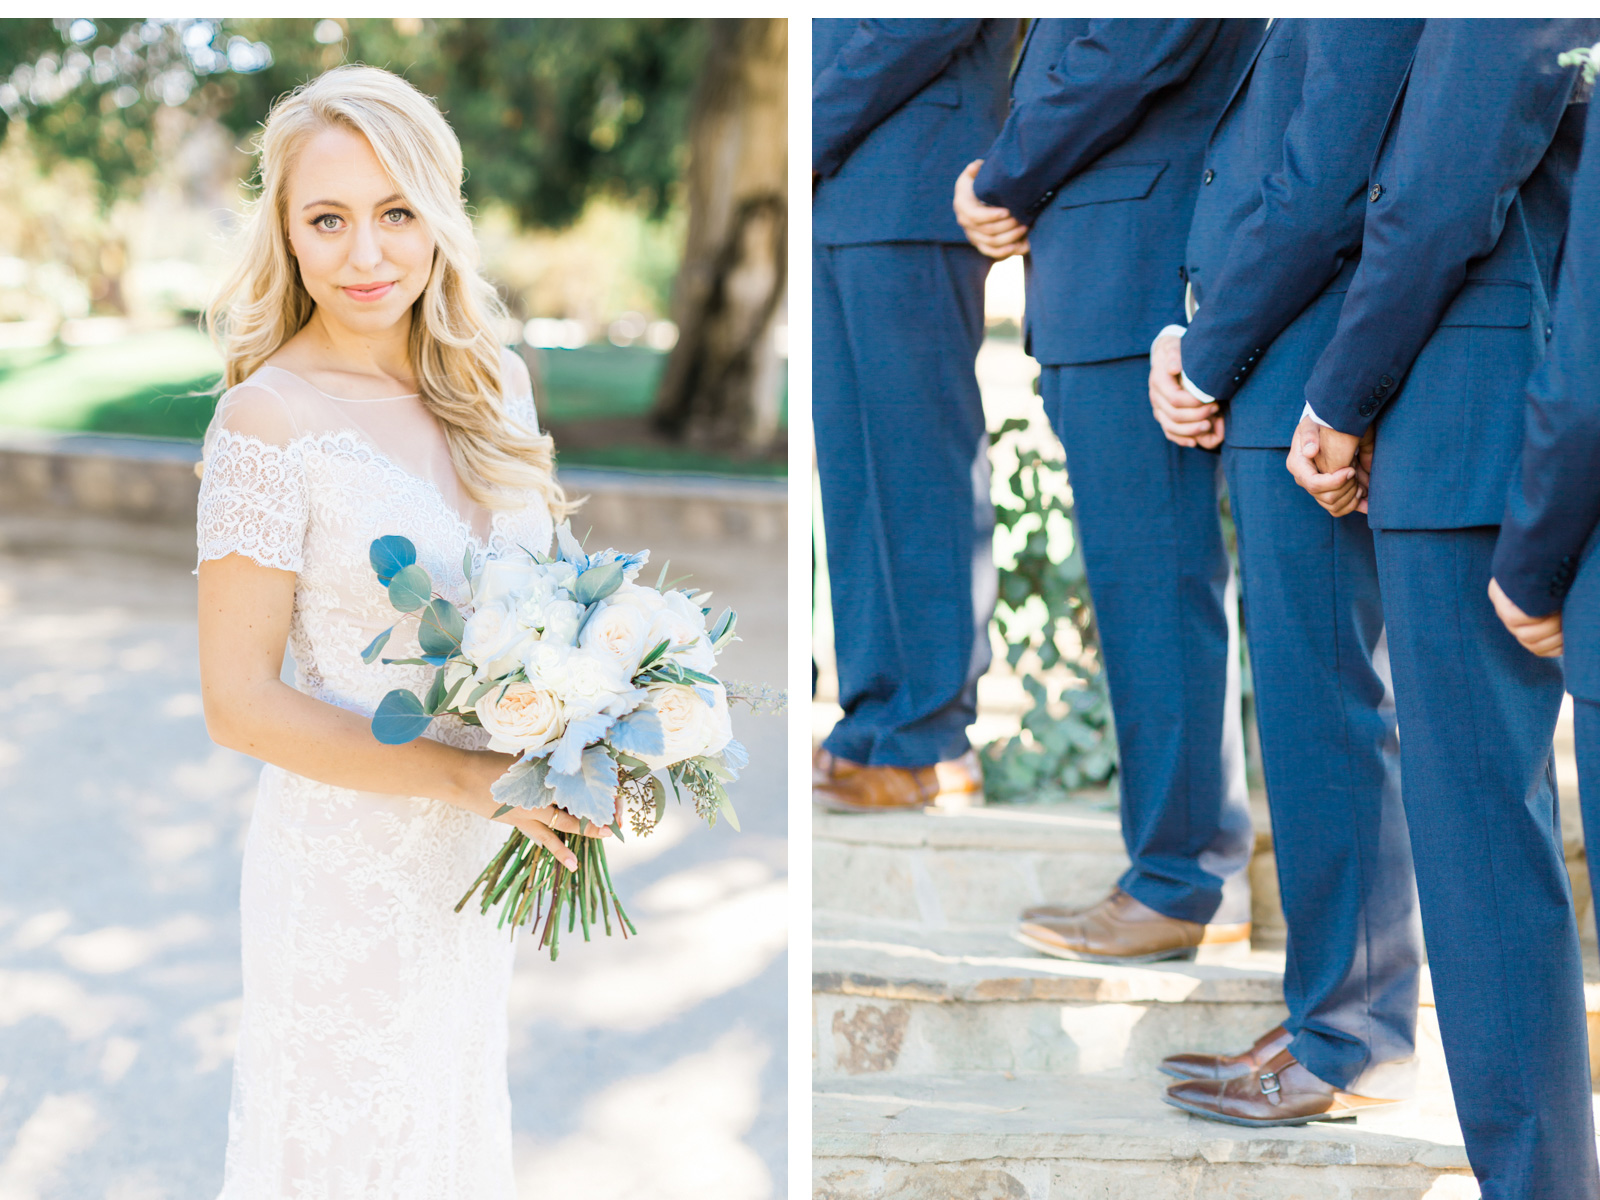 Triunfo-Orange-County-Temecula-Wedding-Photographer-Style-Me-Pretty-Natalie-Schutt-Photography_06.jpg